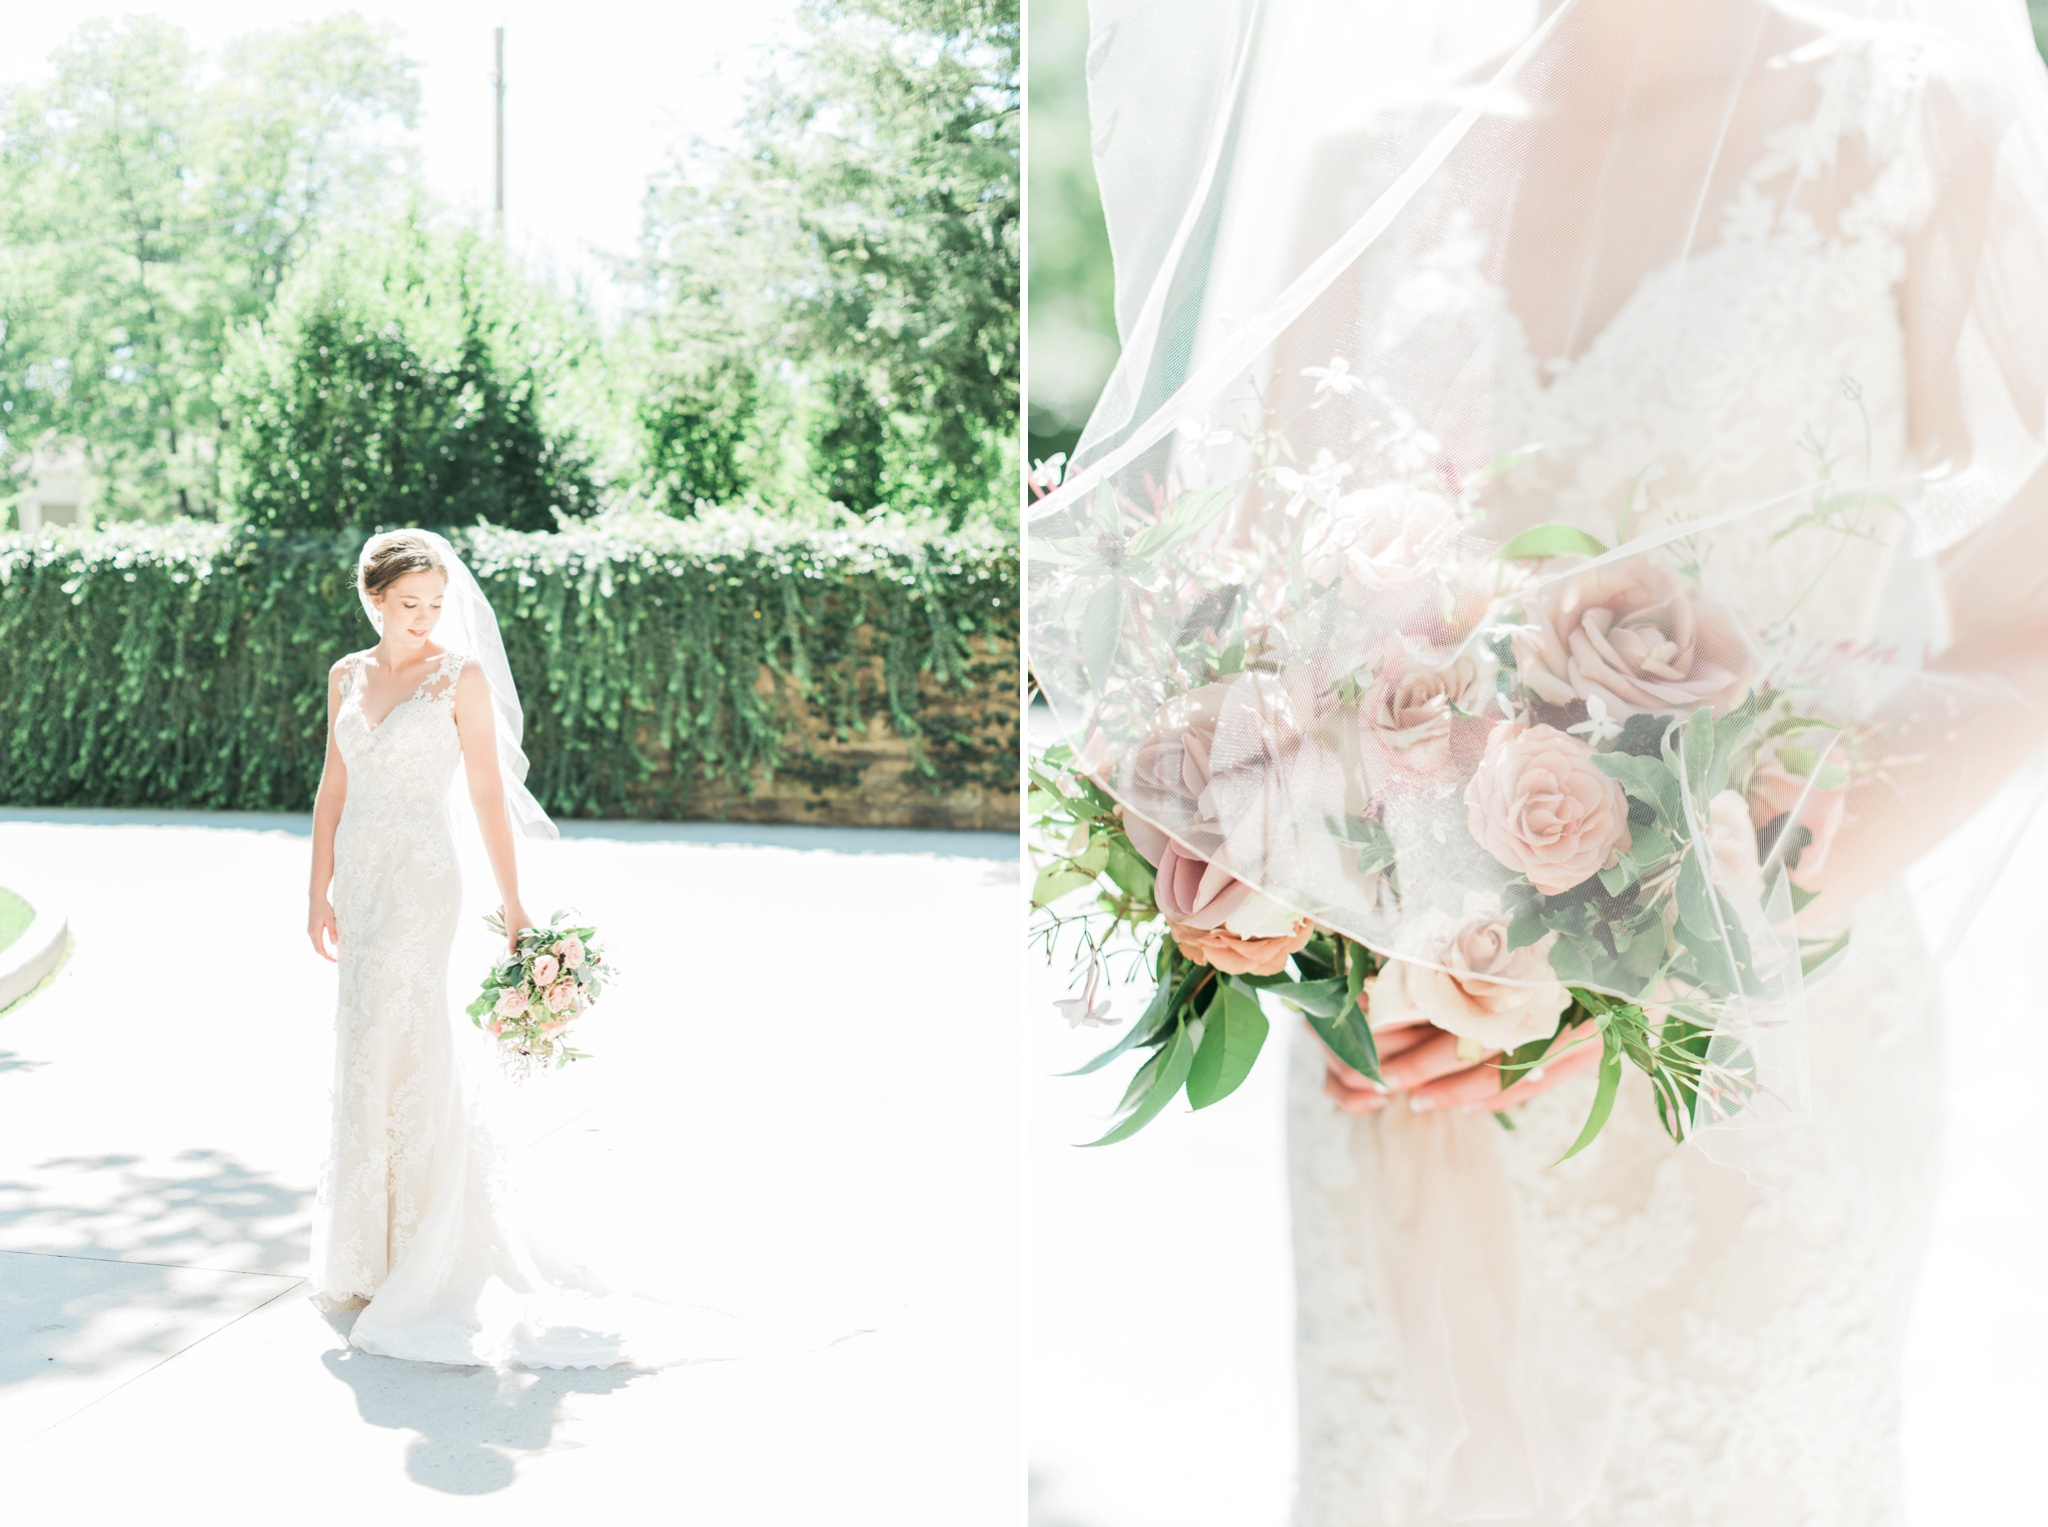 granville-inn-wedding-columbus-ohio-photographer_0021.jpg